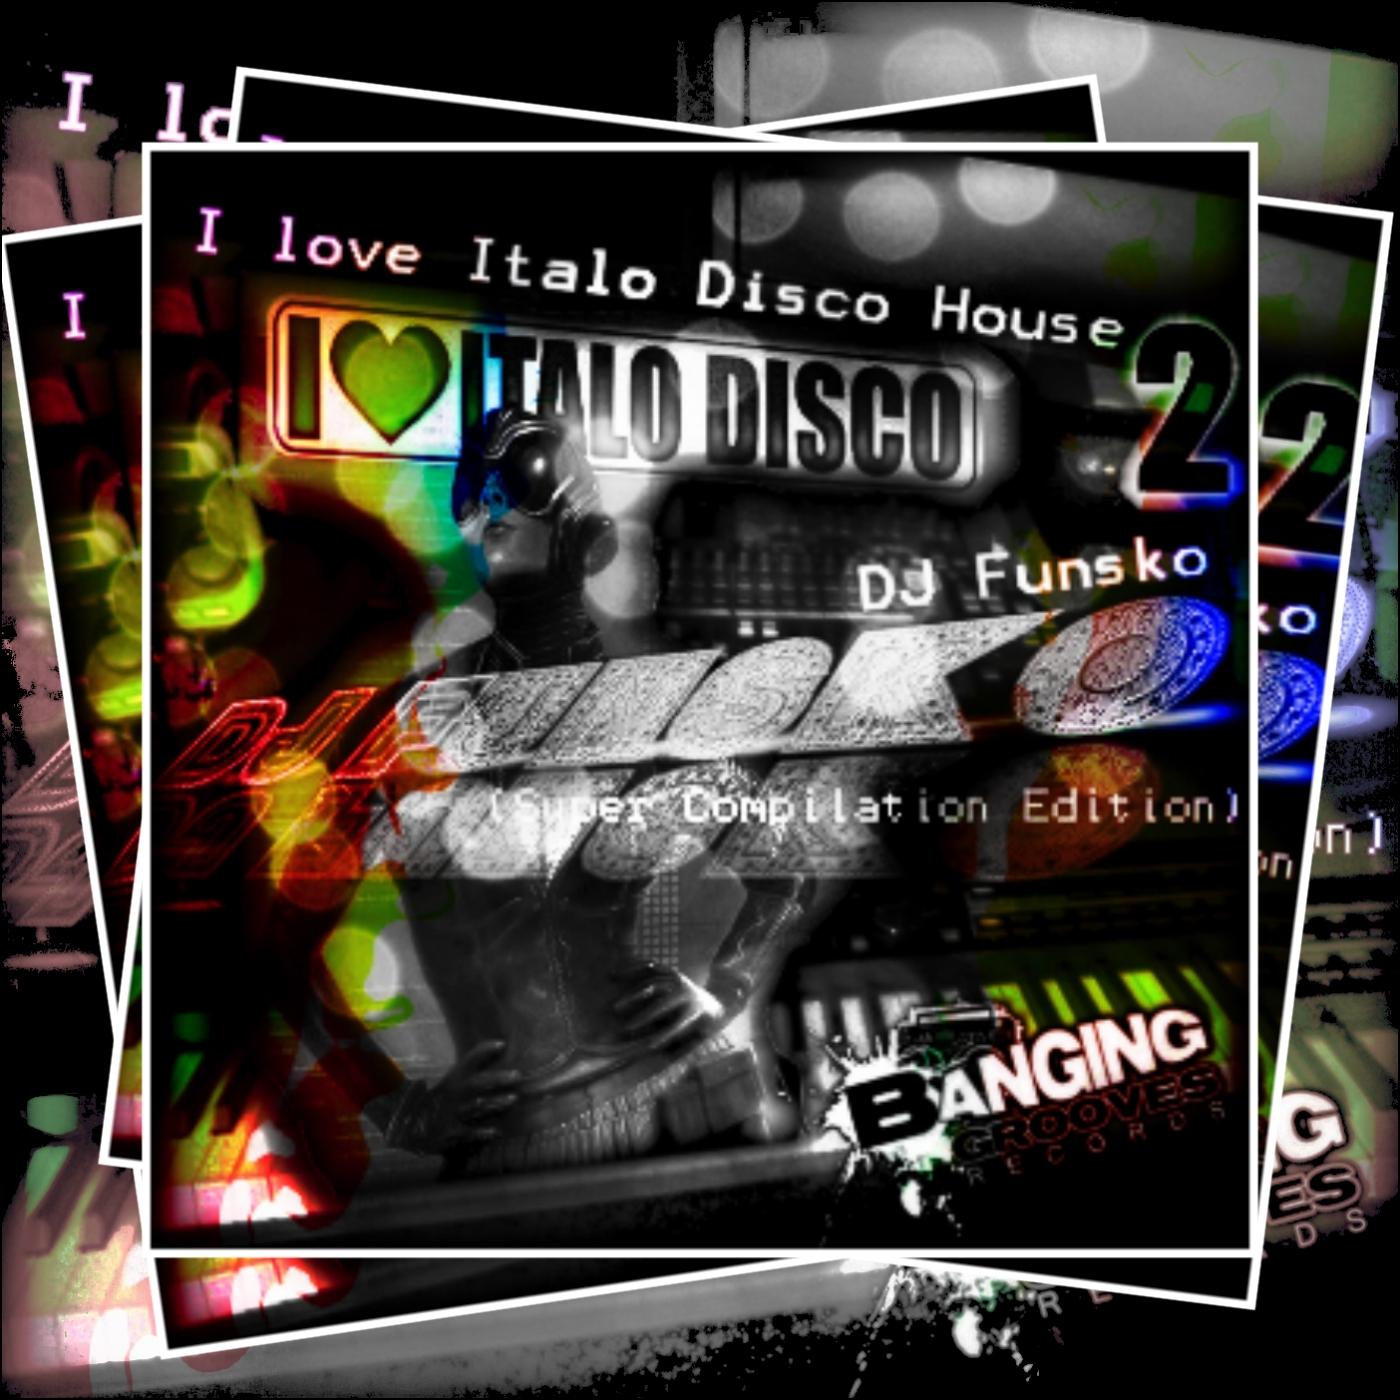 DJ Funsko - DiscoSpaceShip (Original mix)